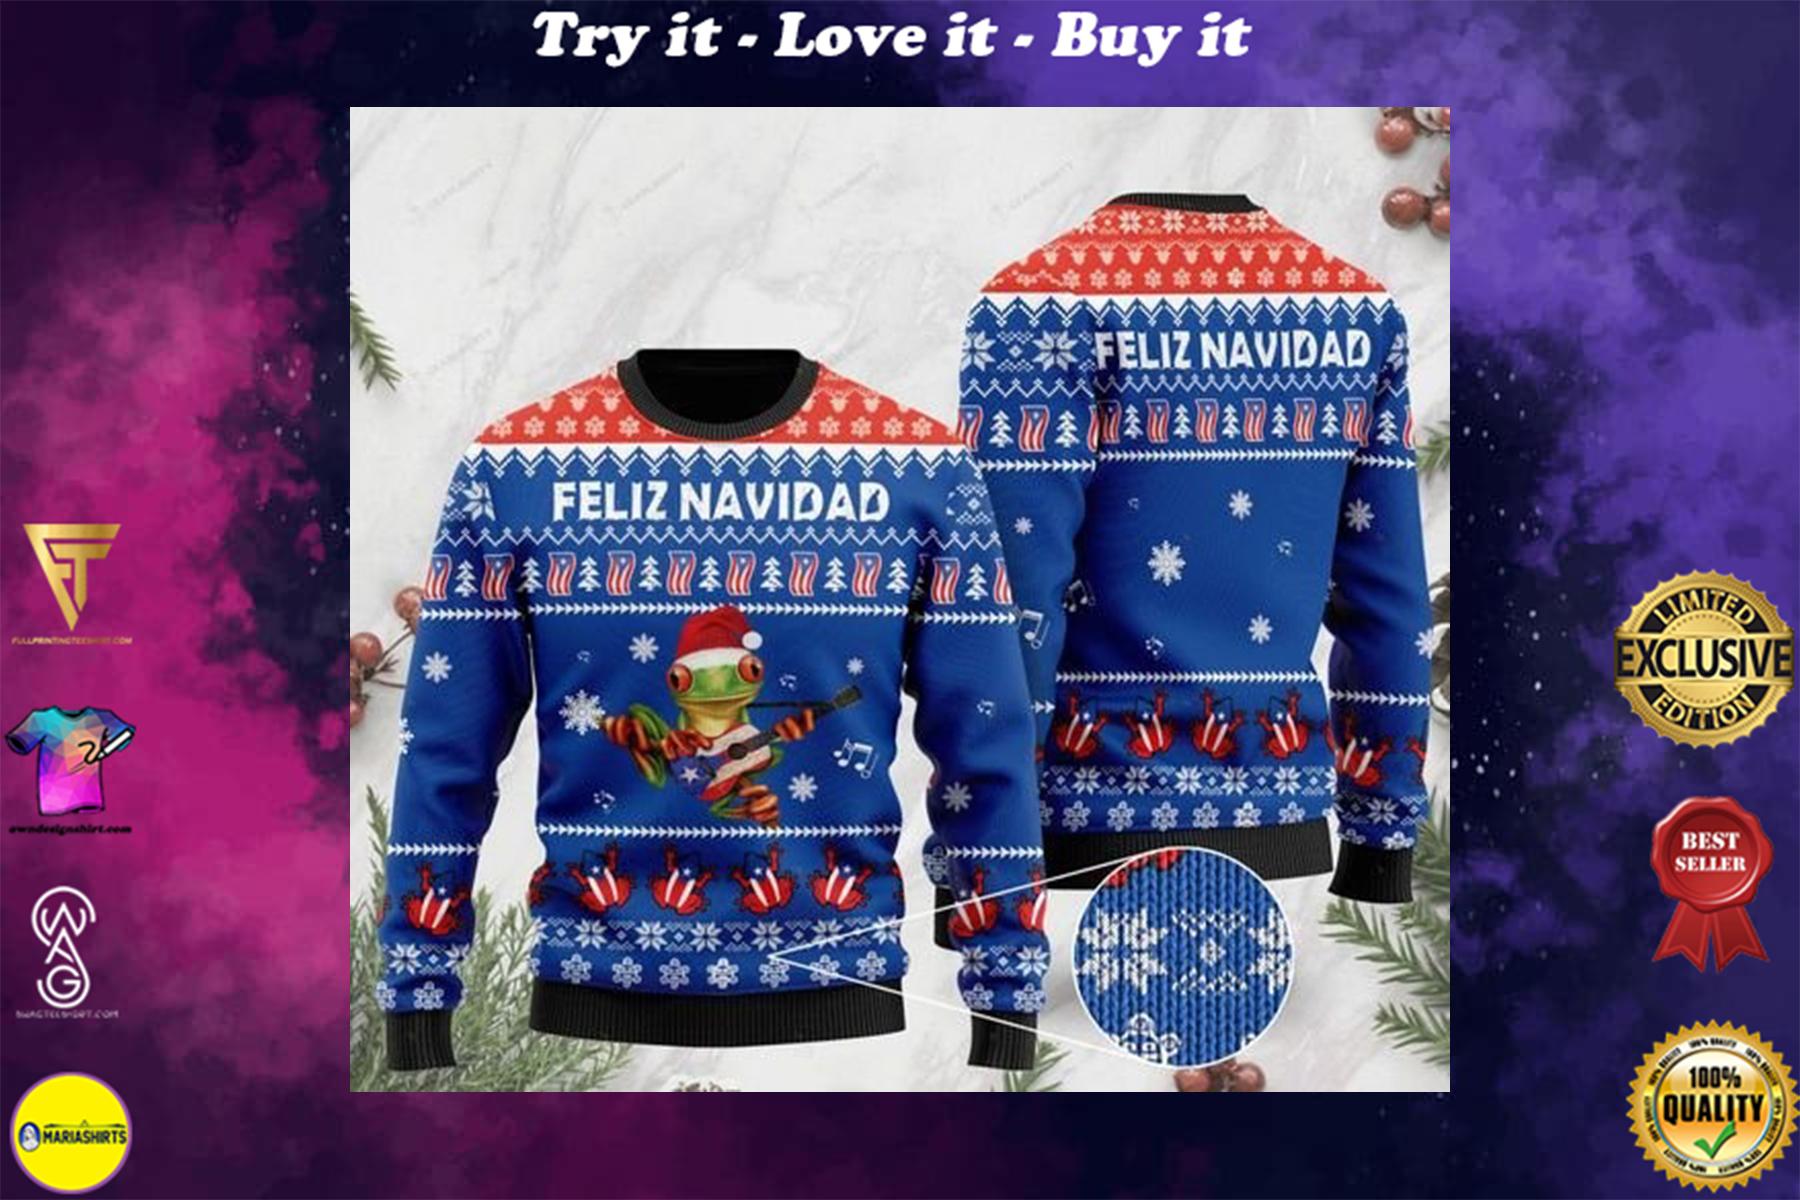 merry christmas puerto rico feliz navidad ugly sweater